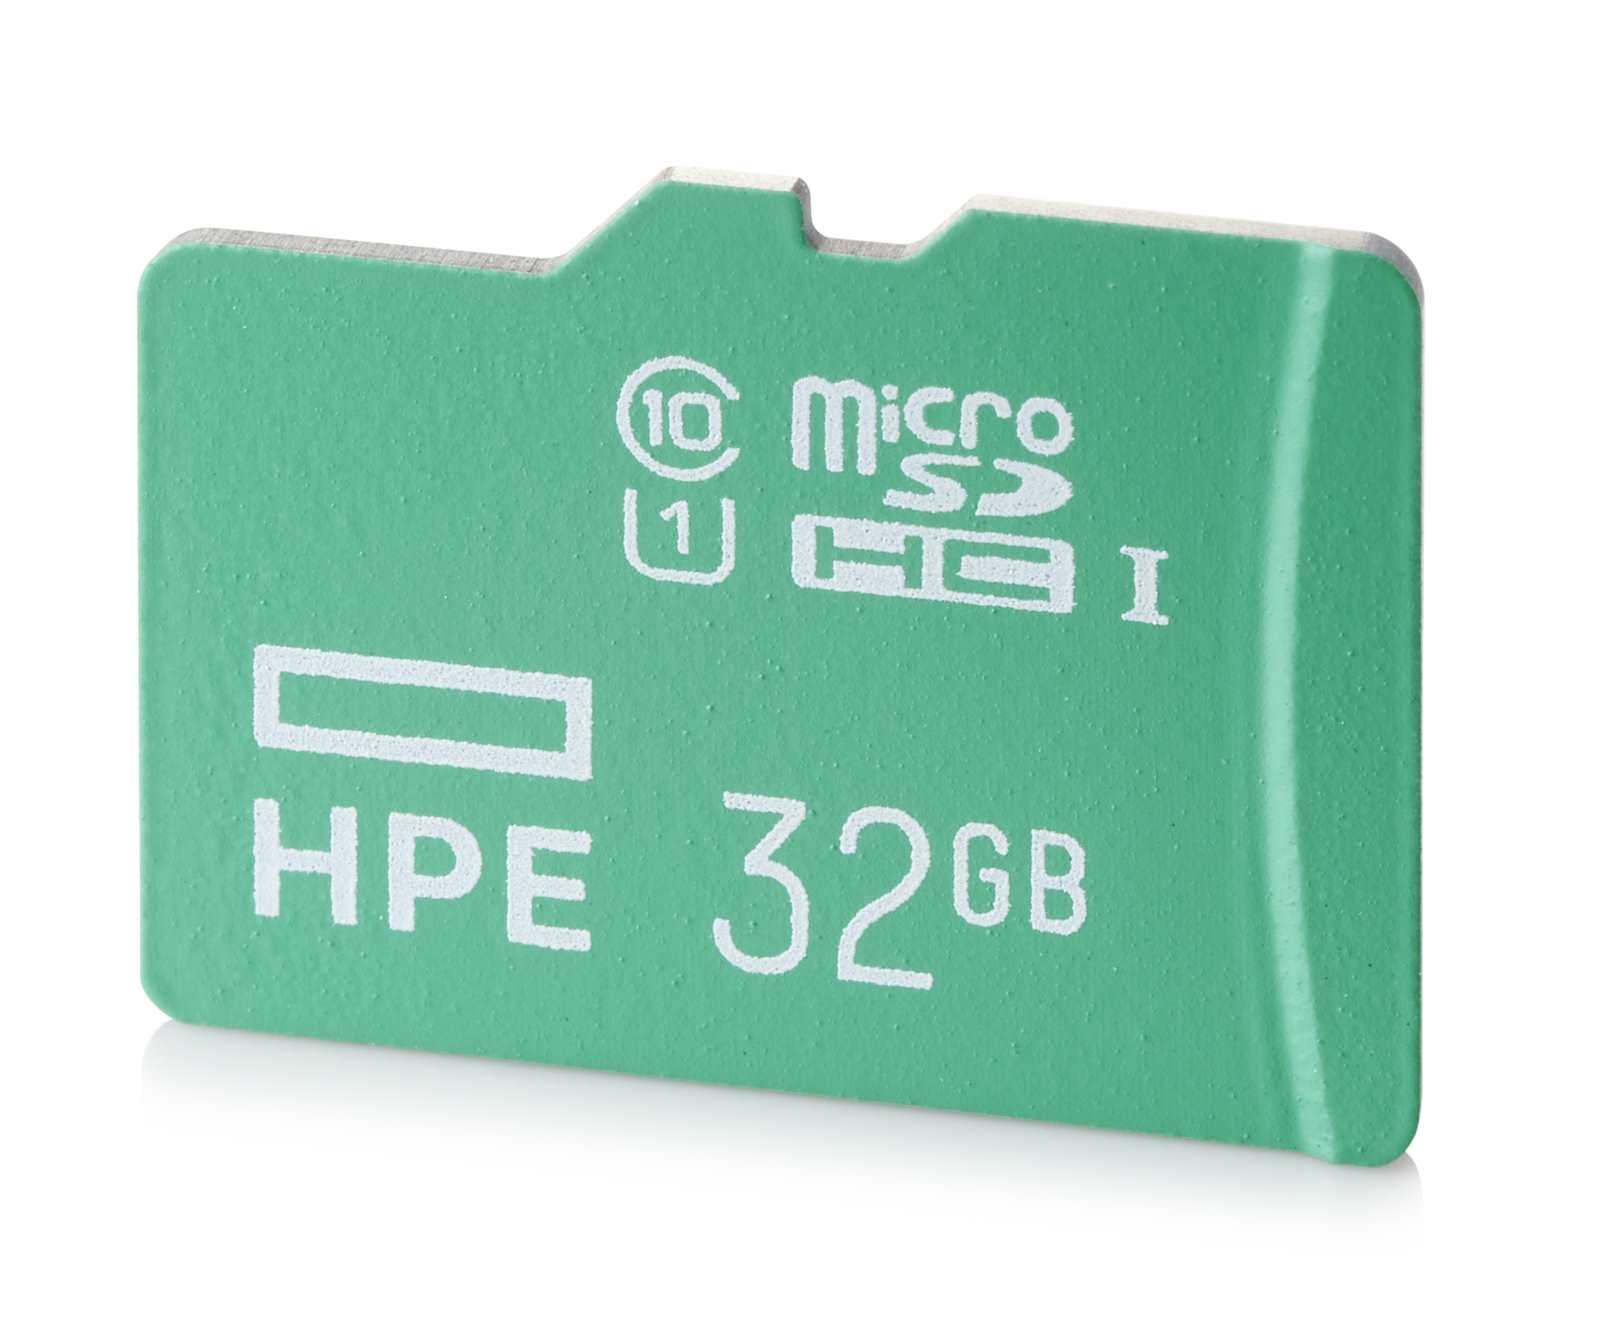 HP 32GB microSD Enterprise Mainstream Flash Media Kit